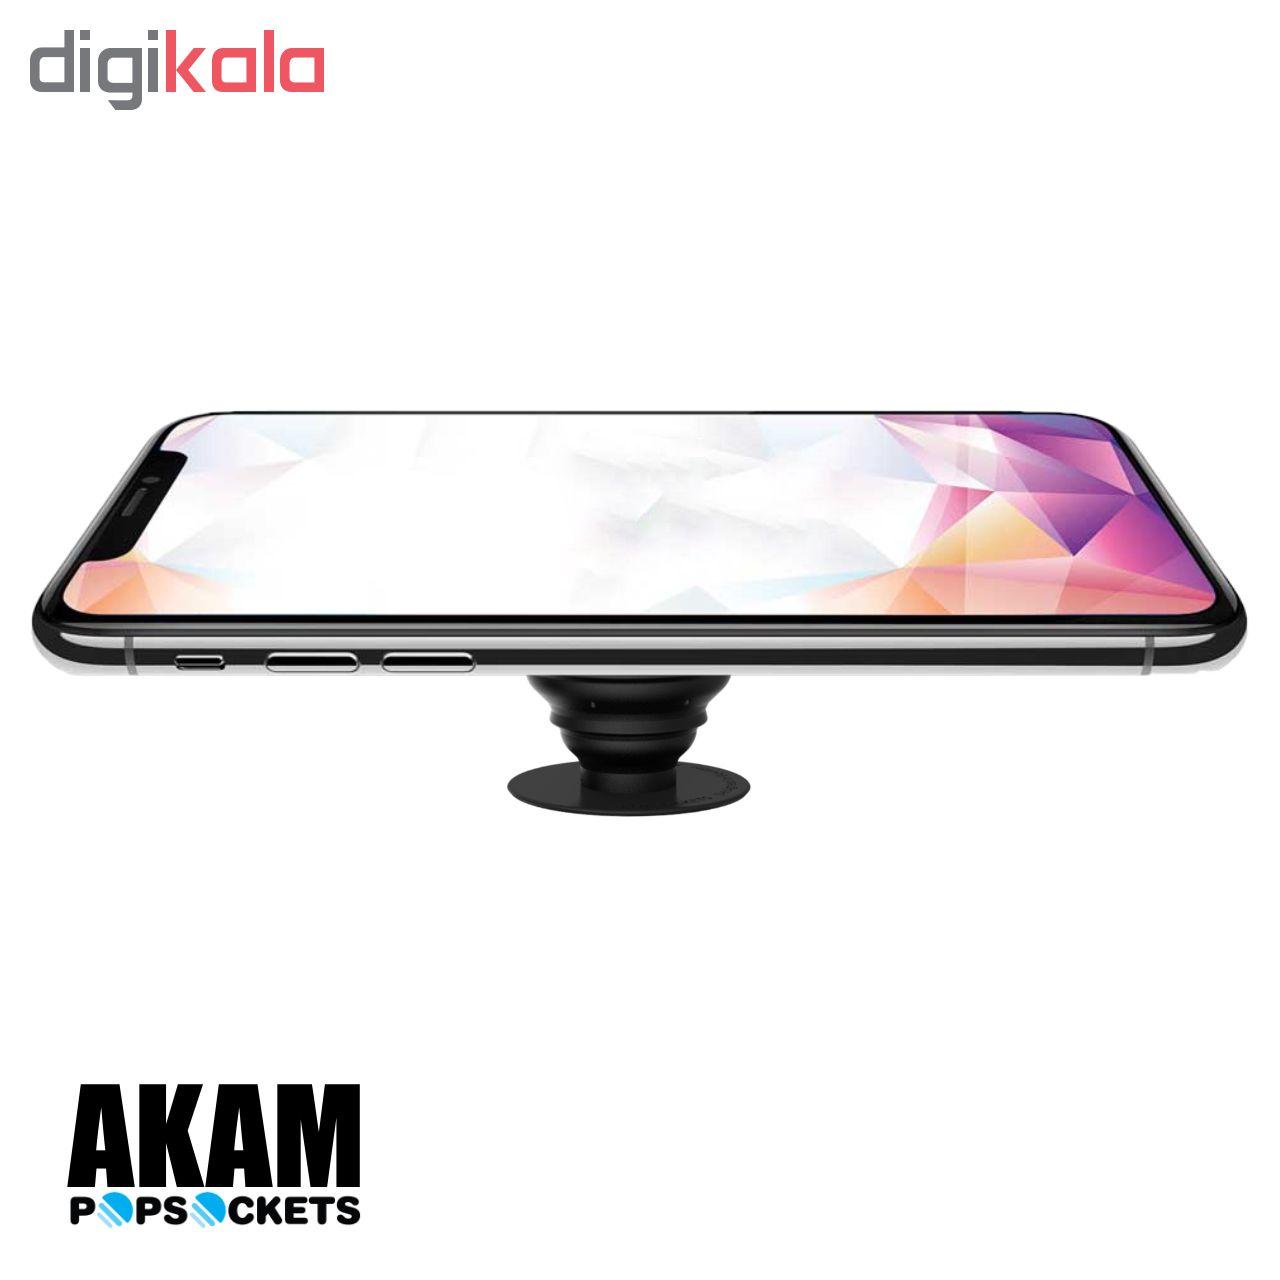 پایه نگهدارنده گوشی موبایل پاپ سوکت آکام مدل APS0021 main 1 5